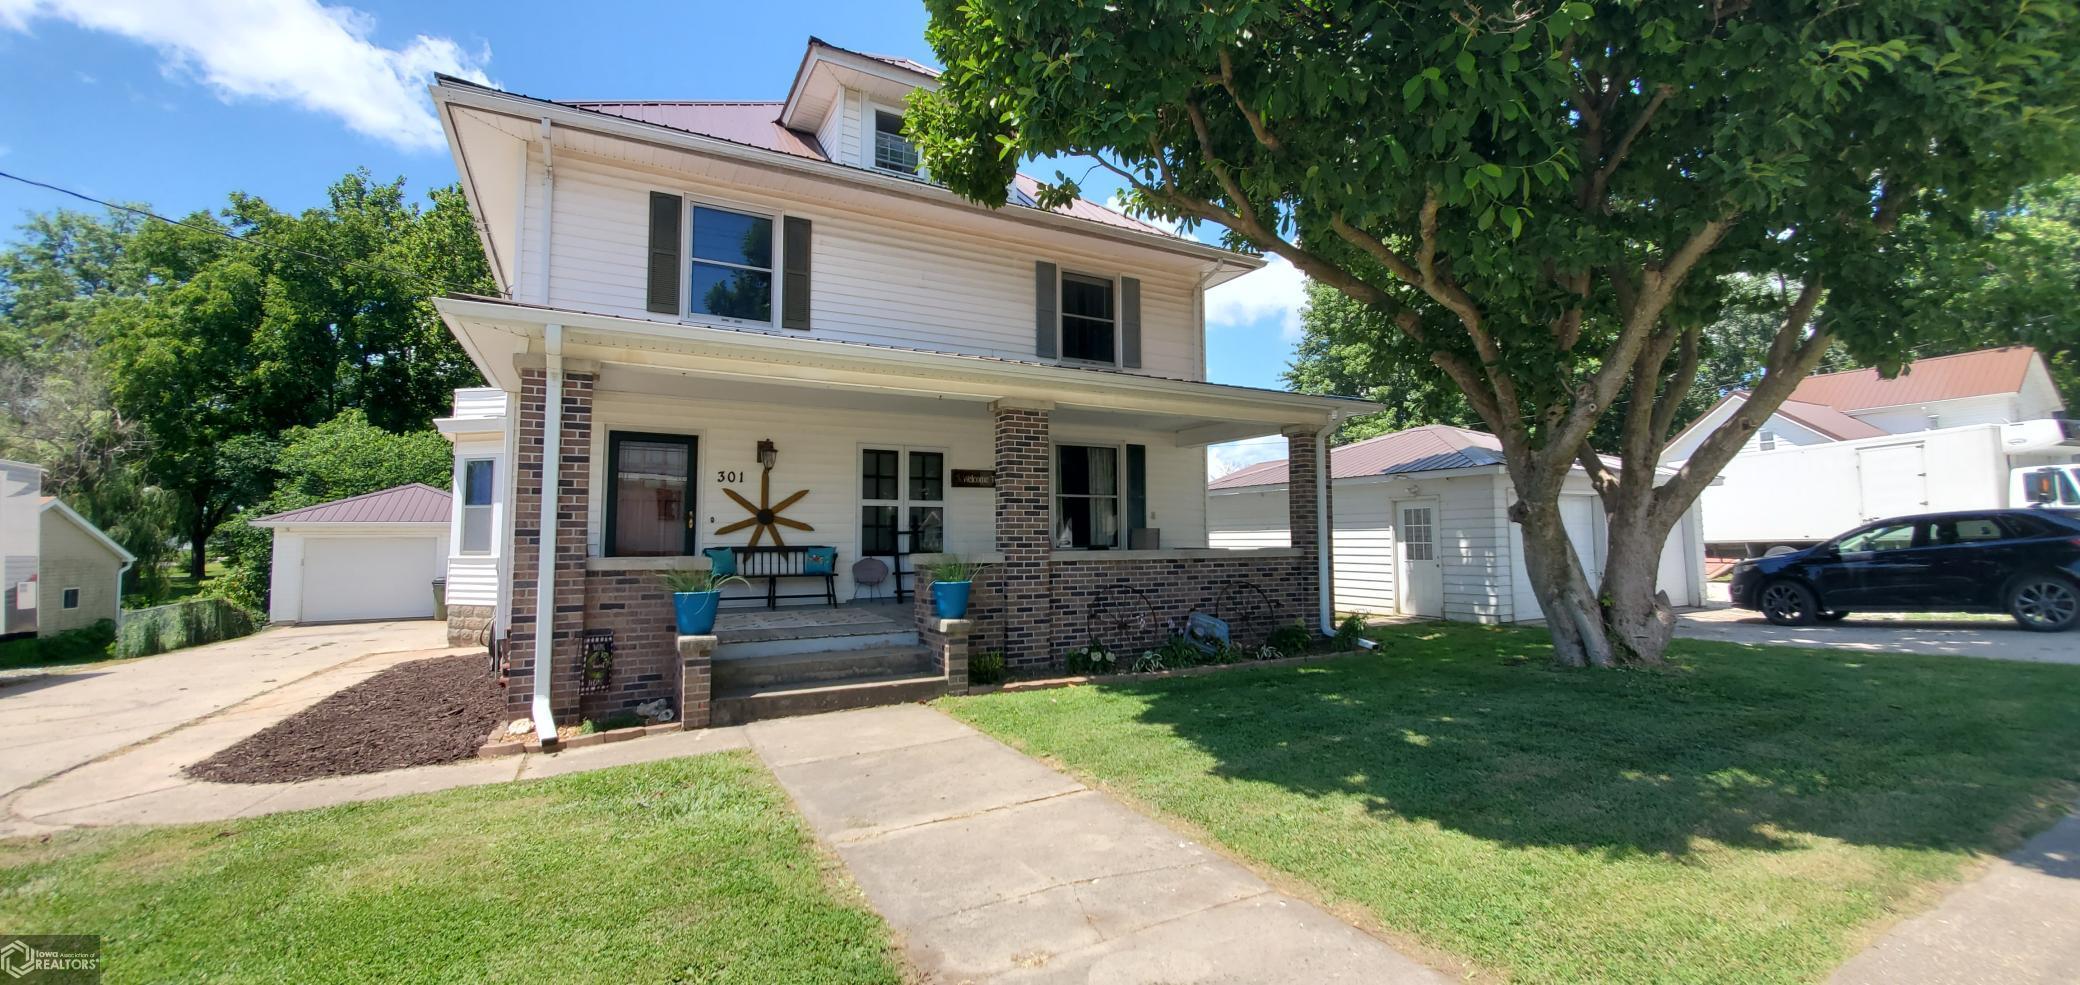 301 Main Property Photo - Danville, IA real estate listing